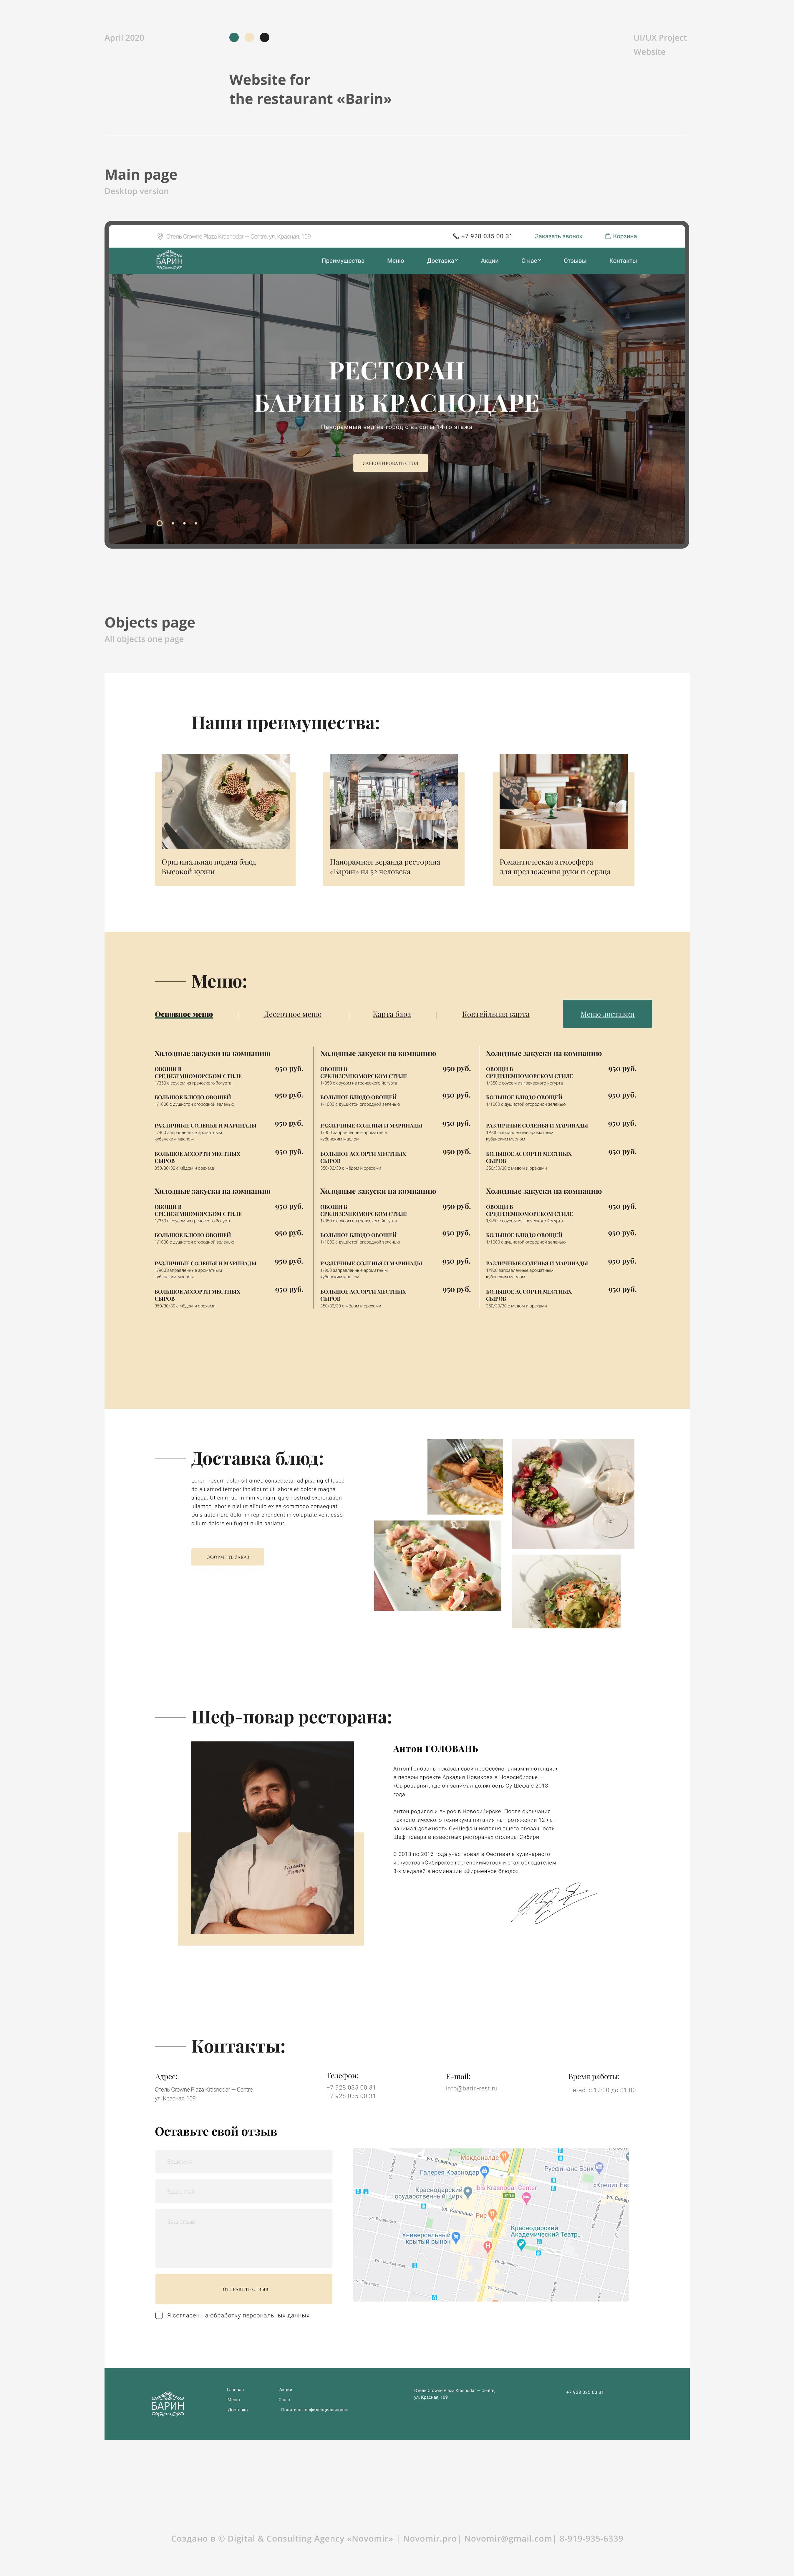 Портфолио - сайт доставки для ресторана Барин в Краснодаре